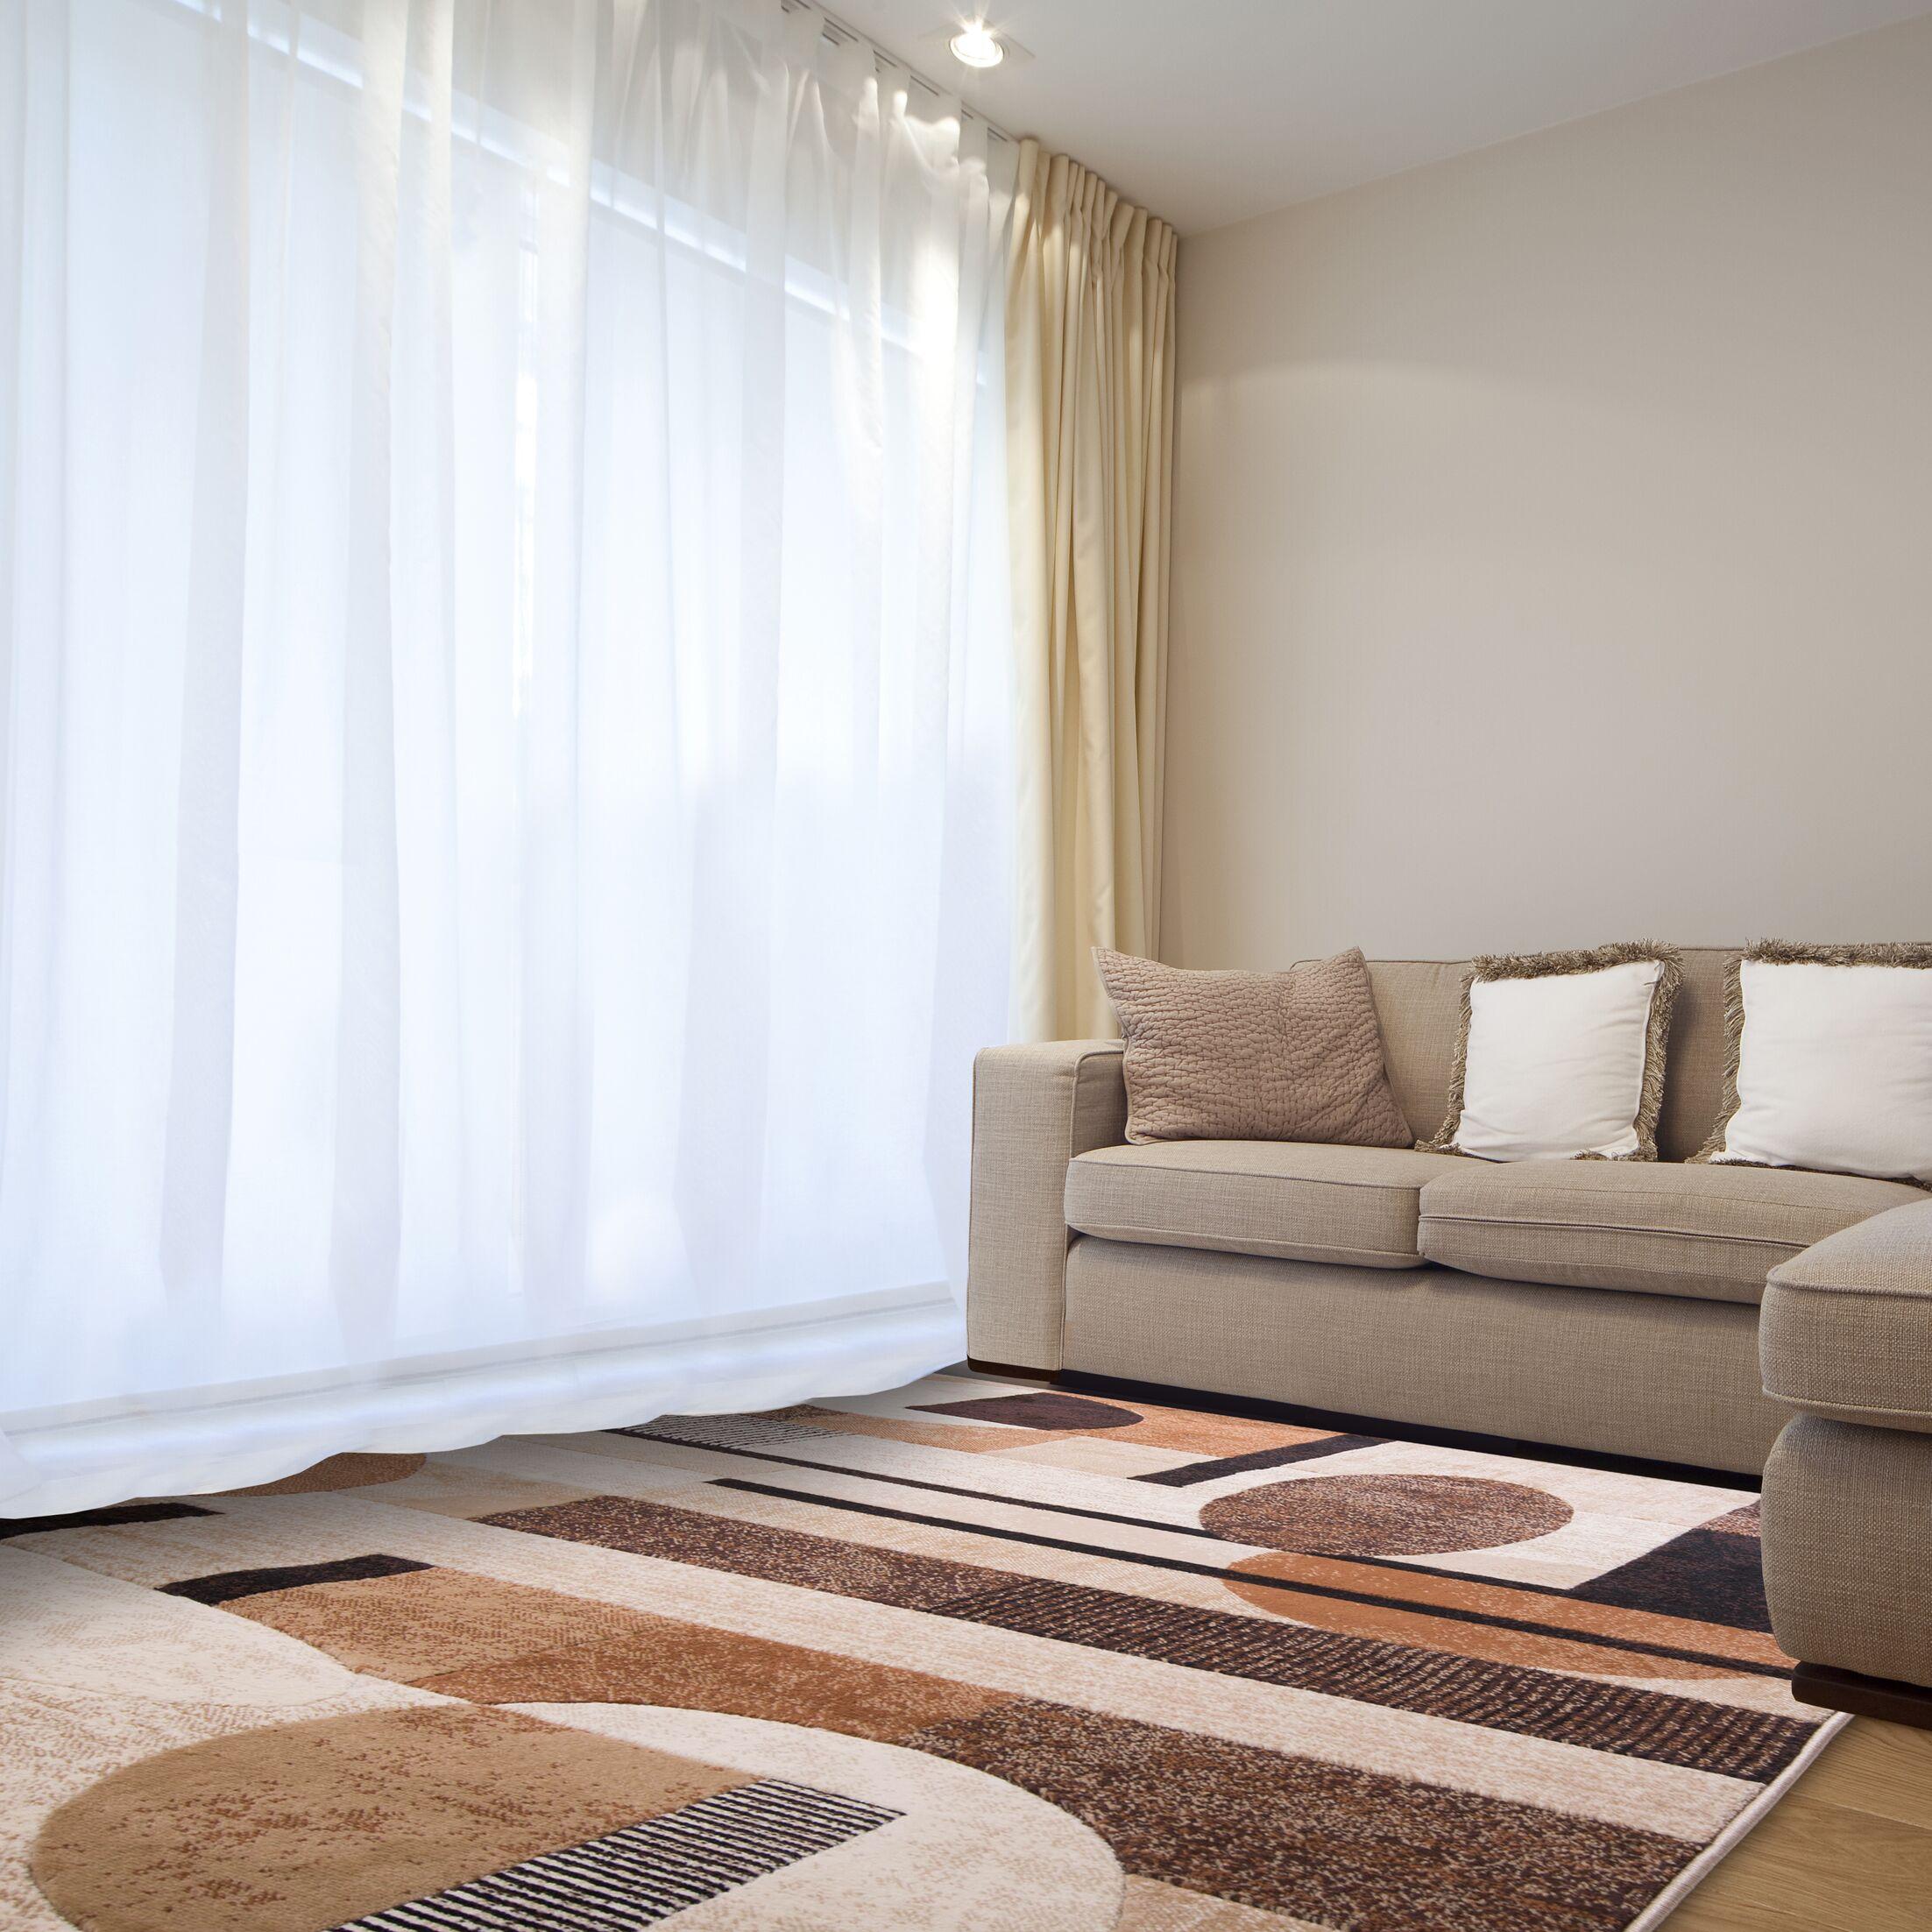 Nolan Patterned Brown/Tan Area Rug Rug Size: Rectangle 7'10